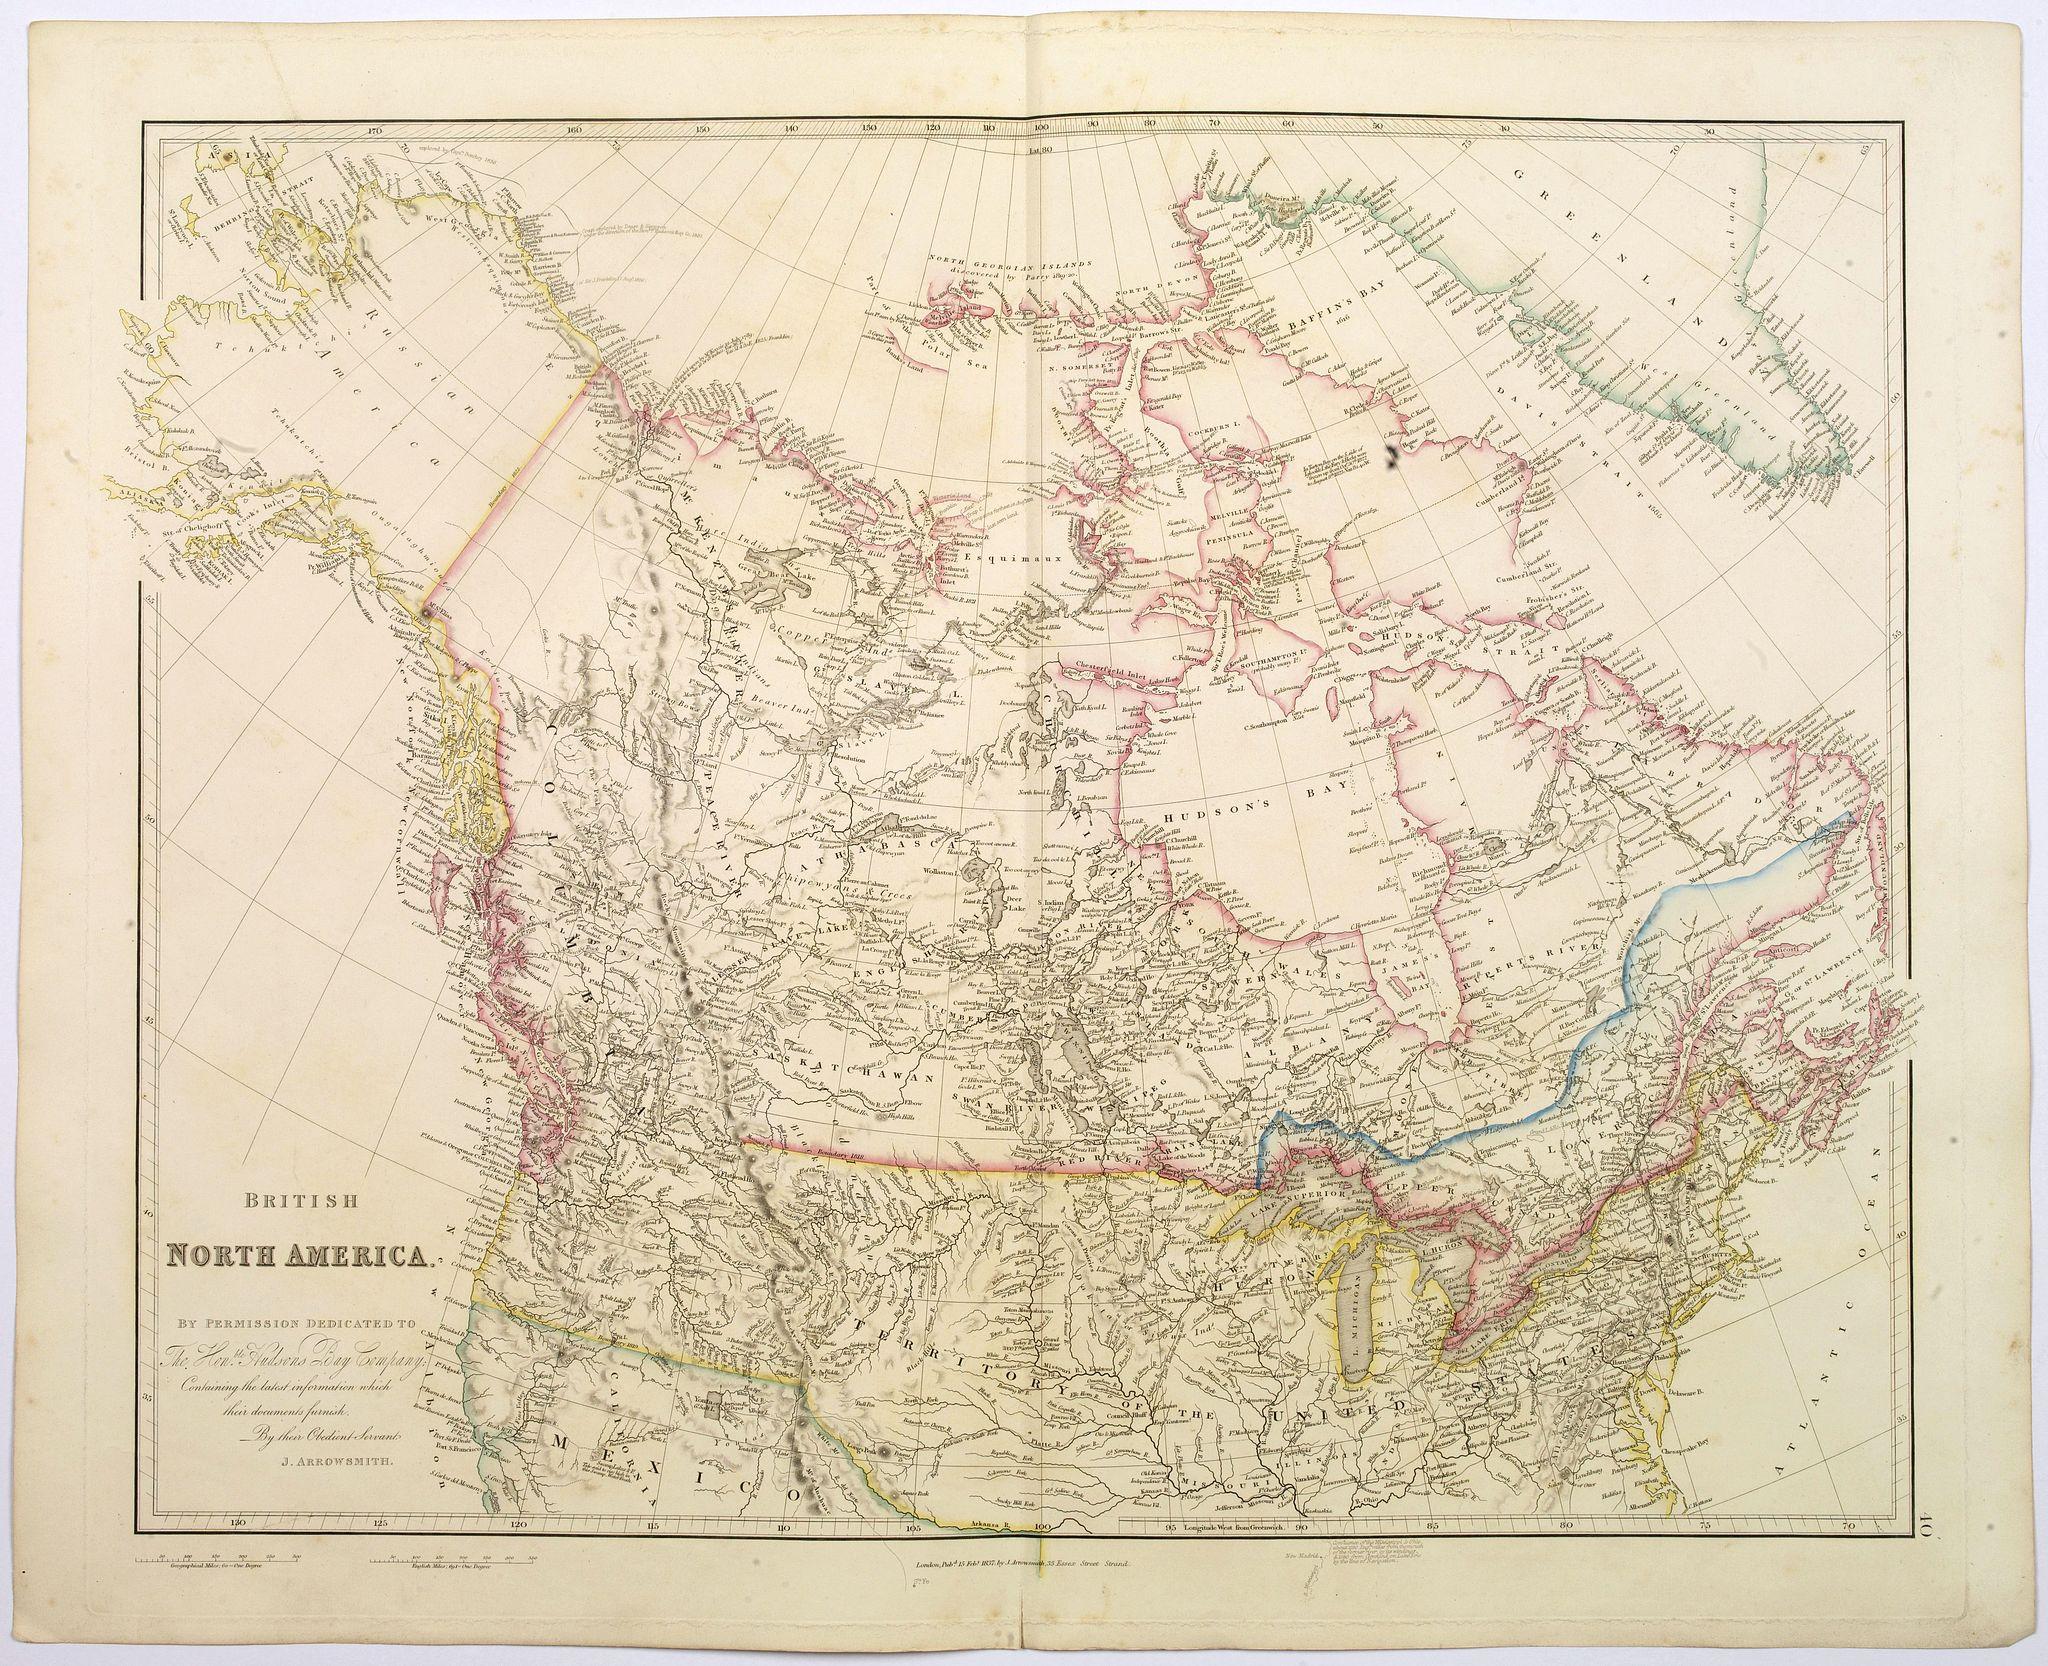 ARROWSMITH, John -  British North America.